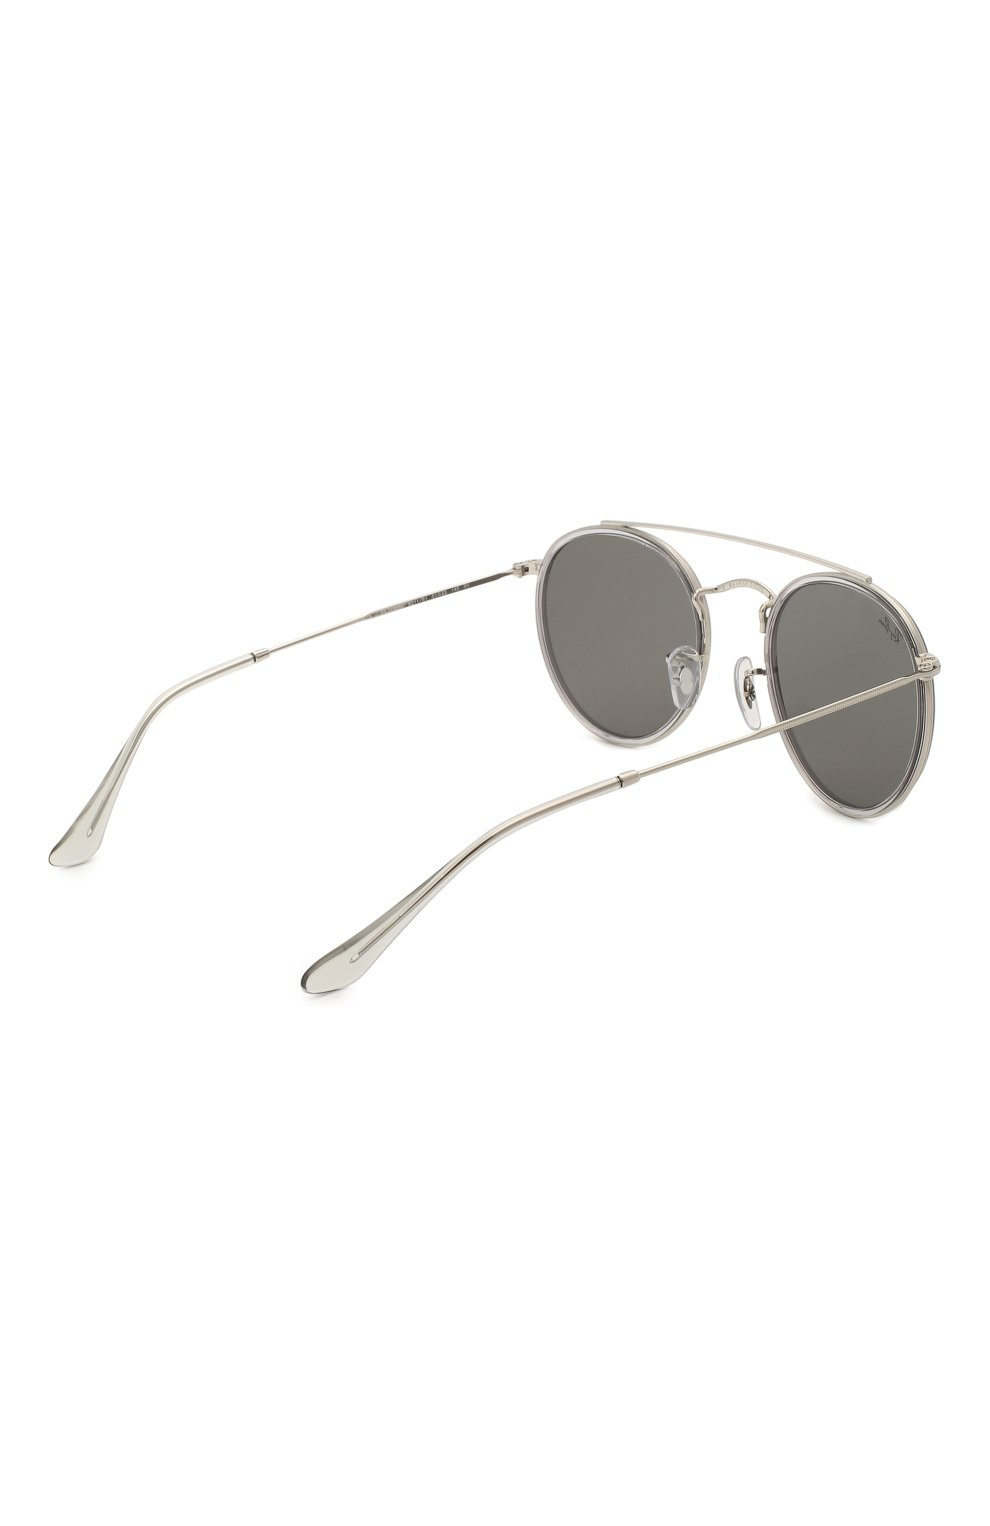 Женские солнцезащитные очки RAY-BAN серого цвета, арт. 3647N-9211B1 | Фото 5